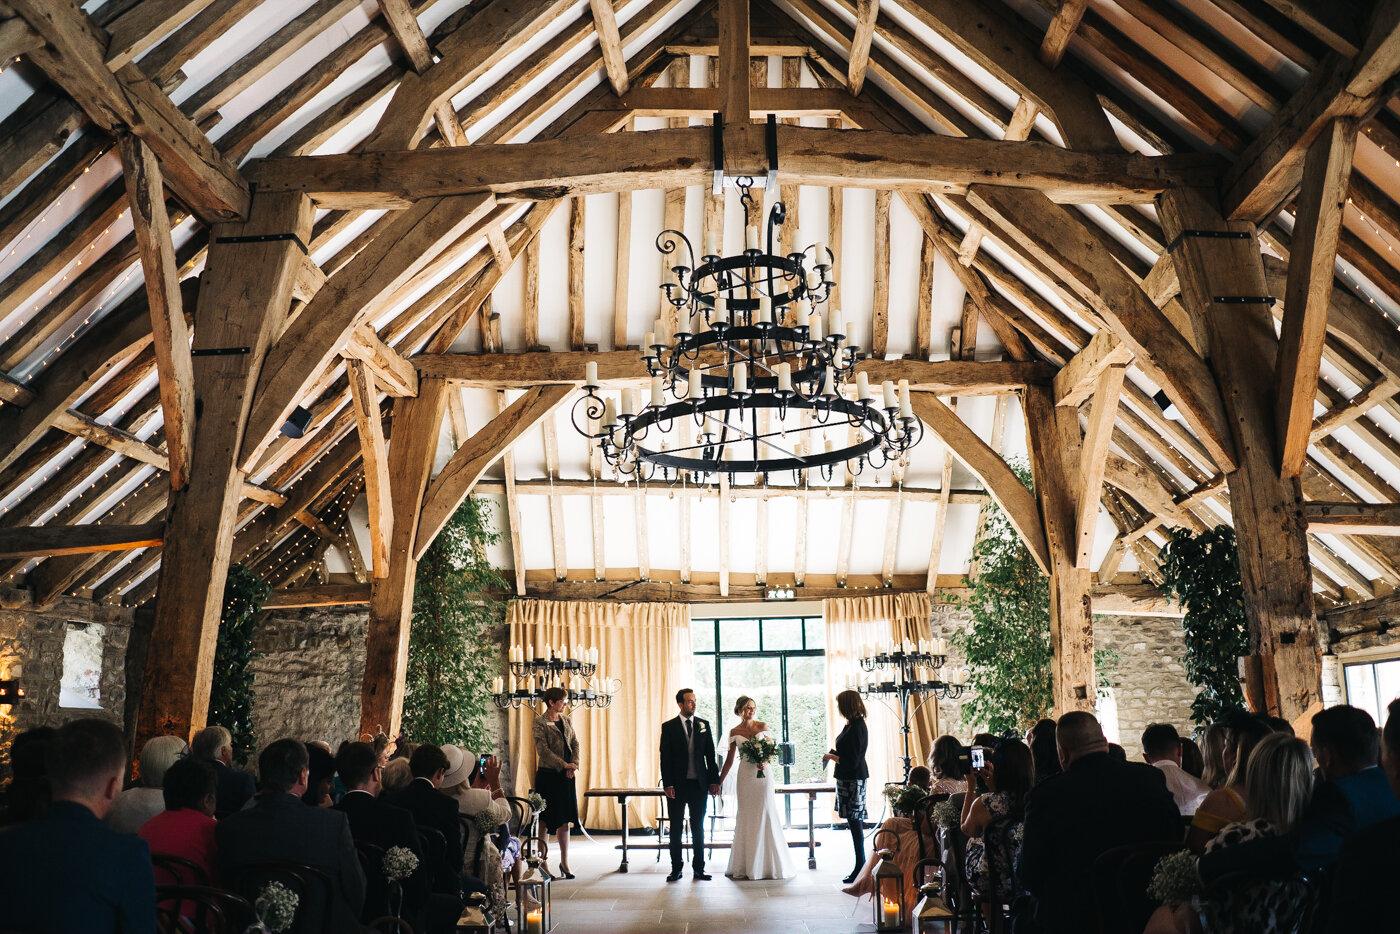 tithe-barn-bolton-abbey-north-yorkshire-cripps-wedding-photographer-creative-0028.jpg